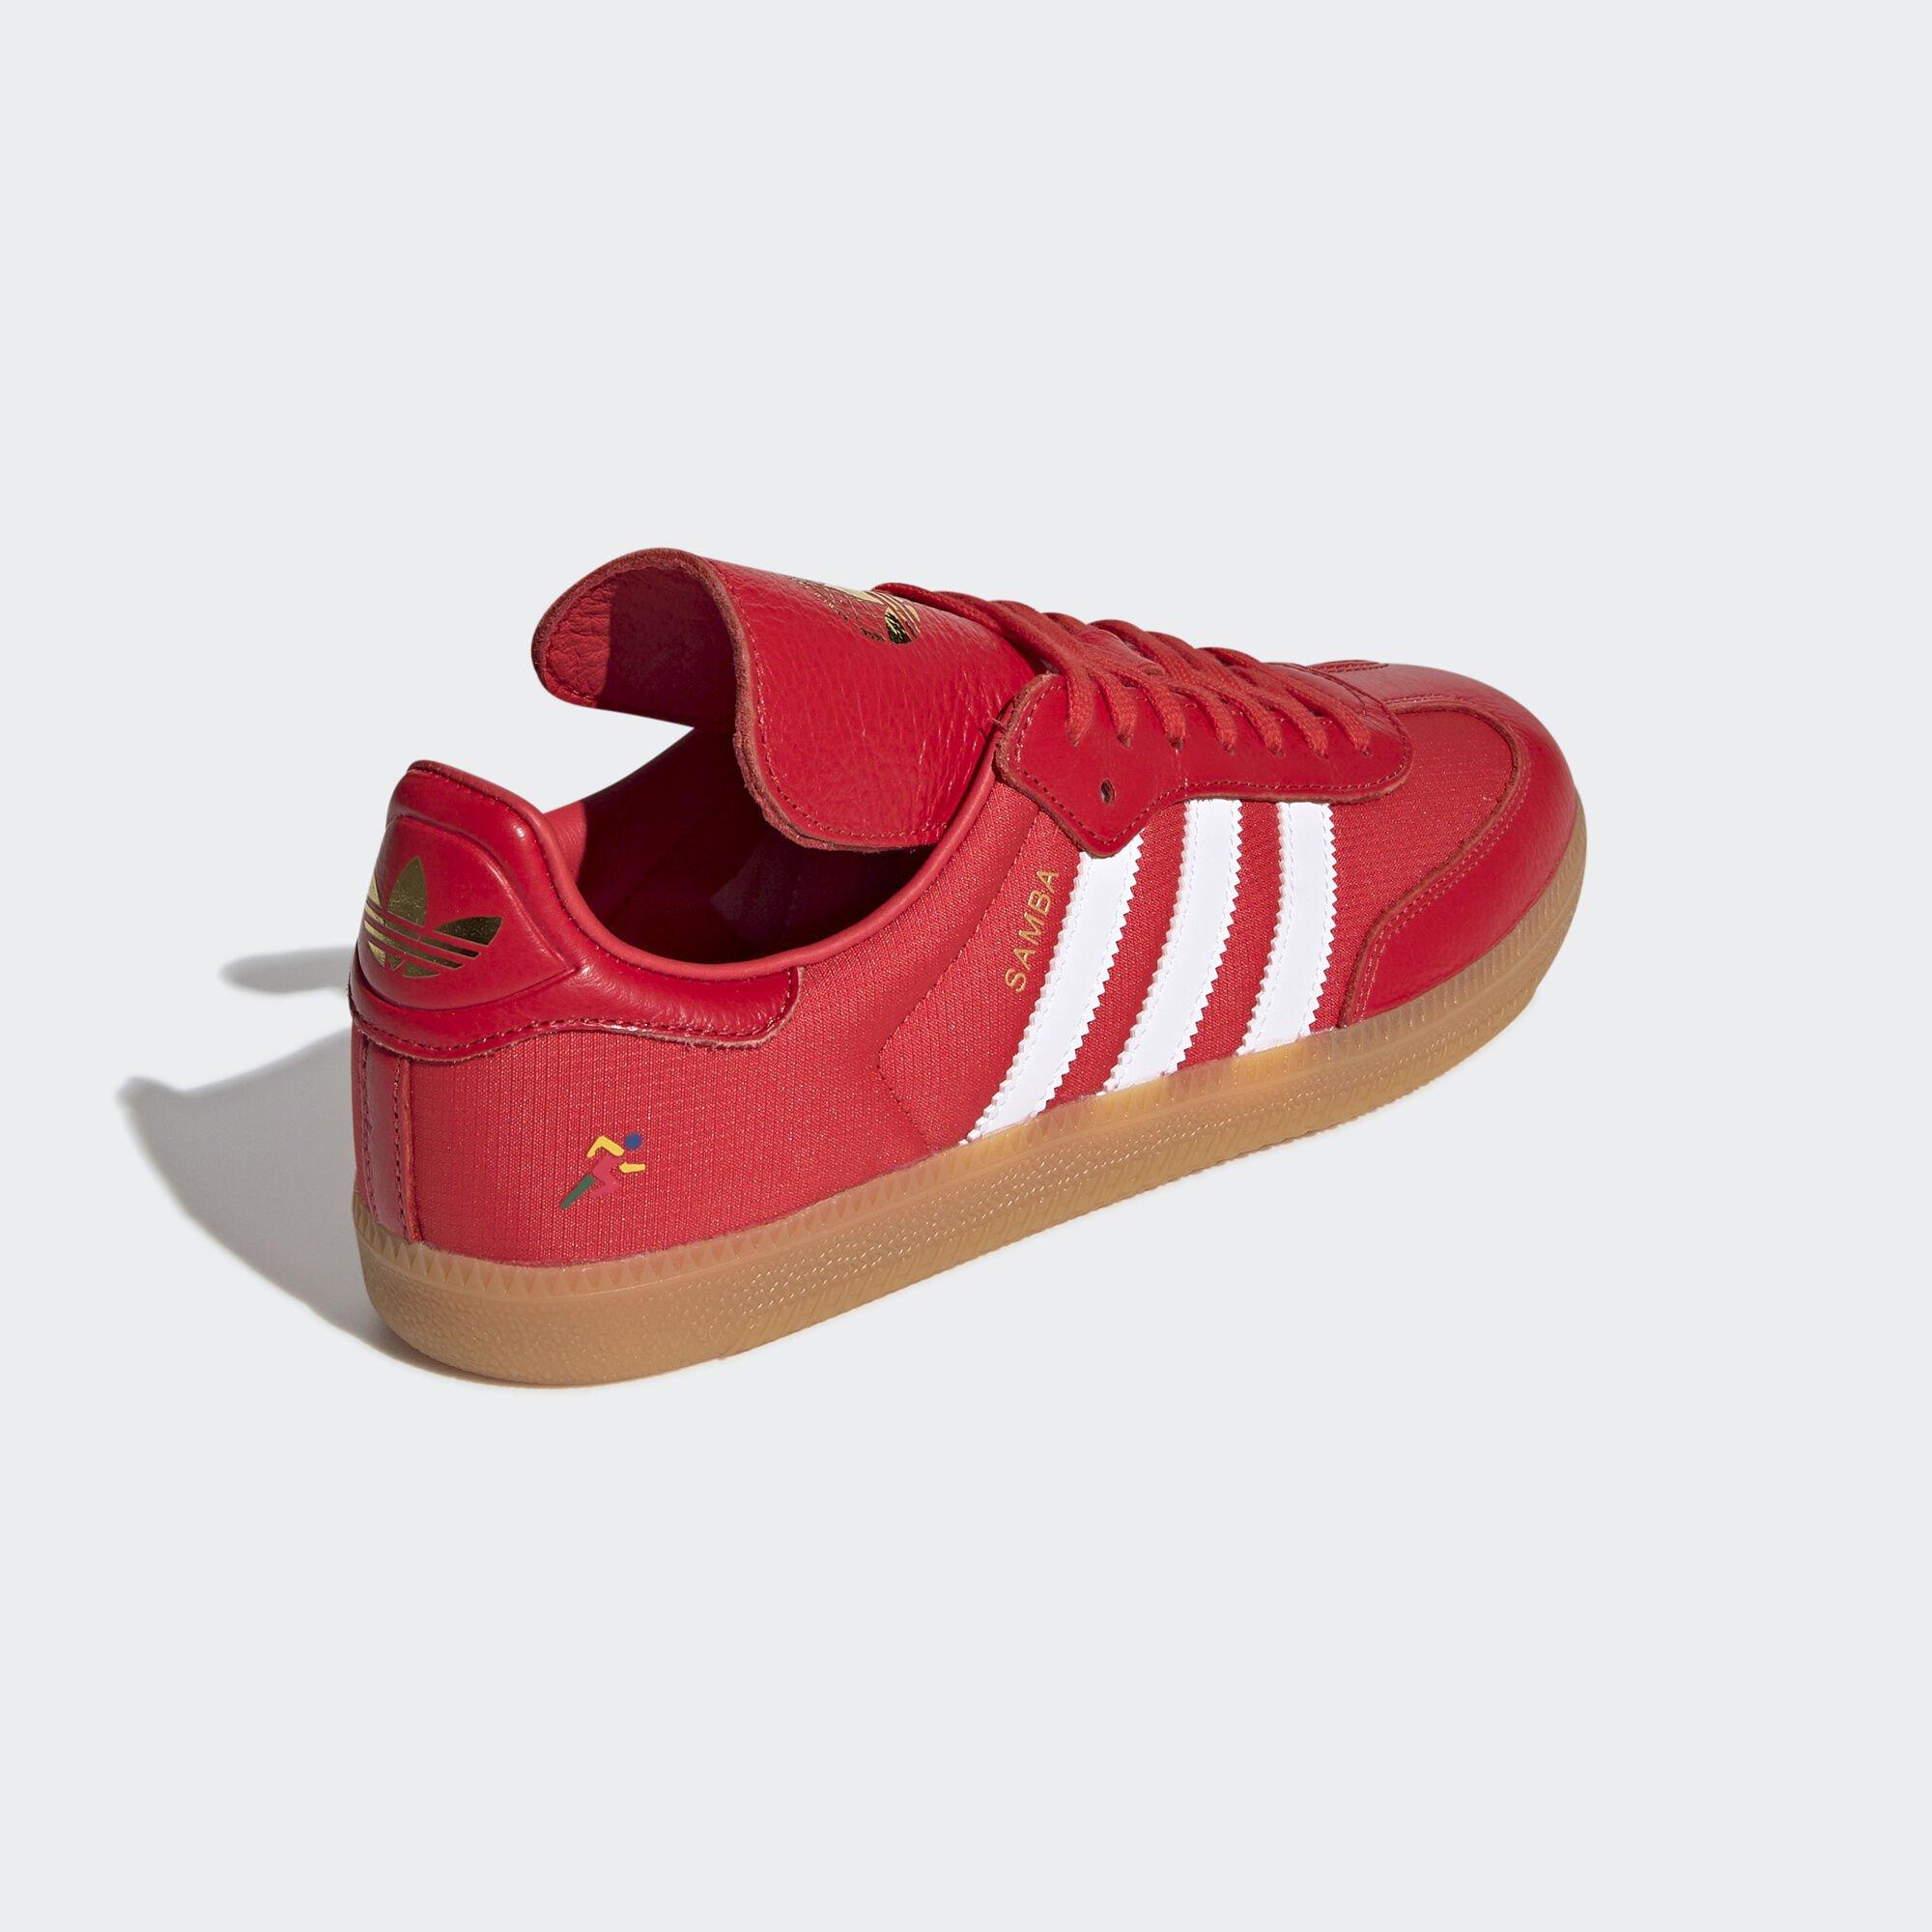 Adidas Samba G26700